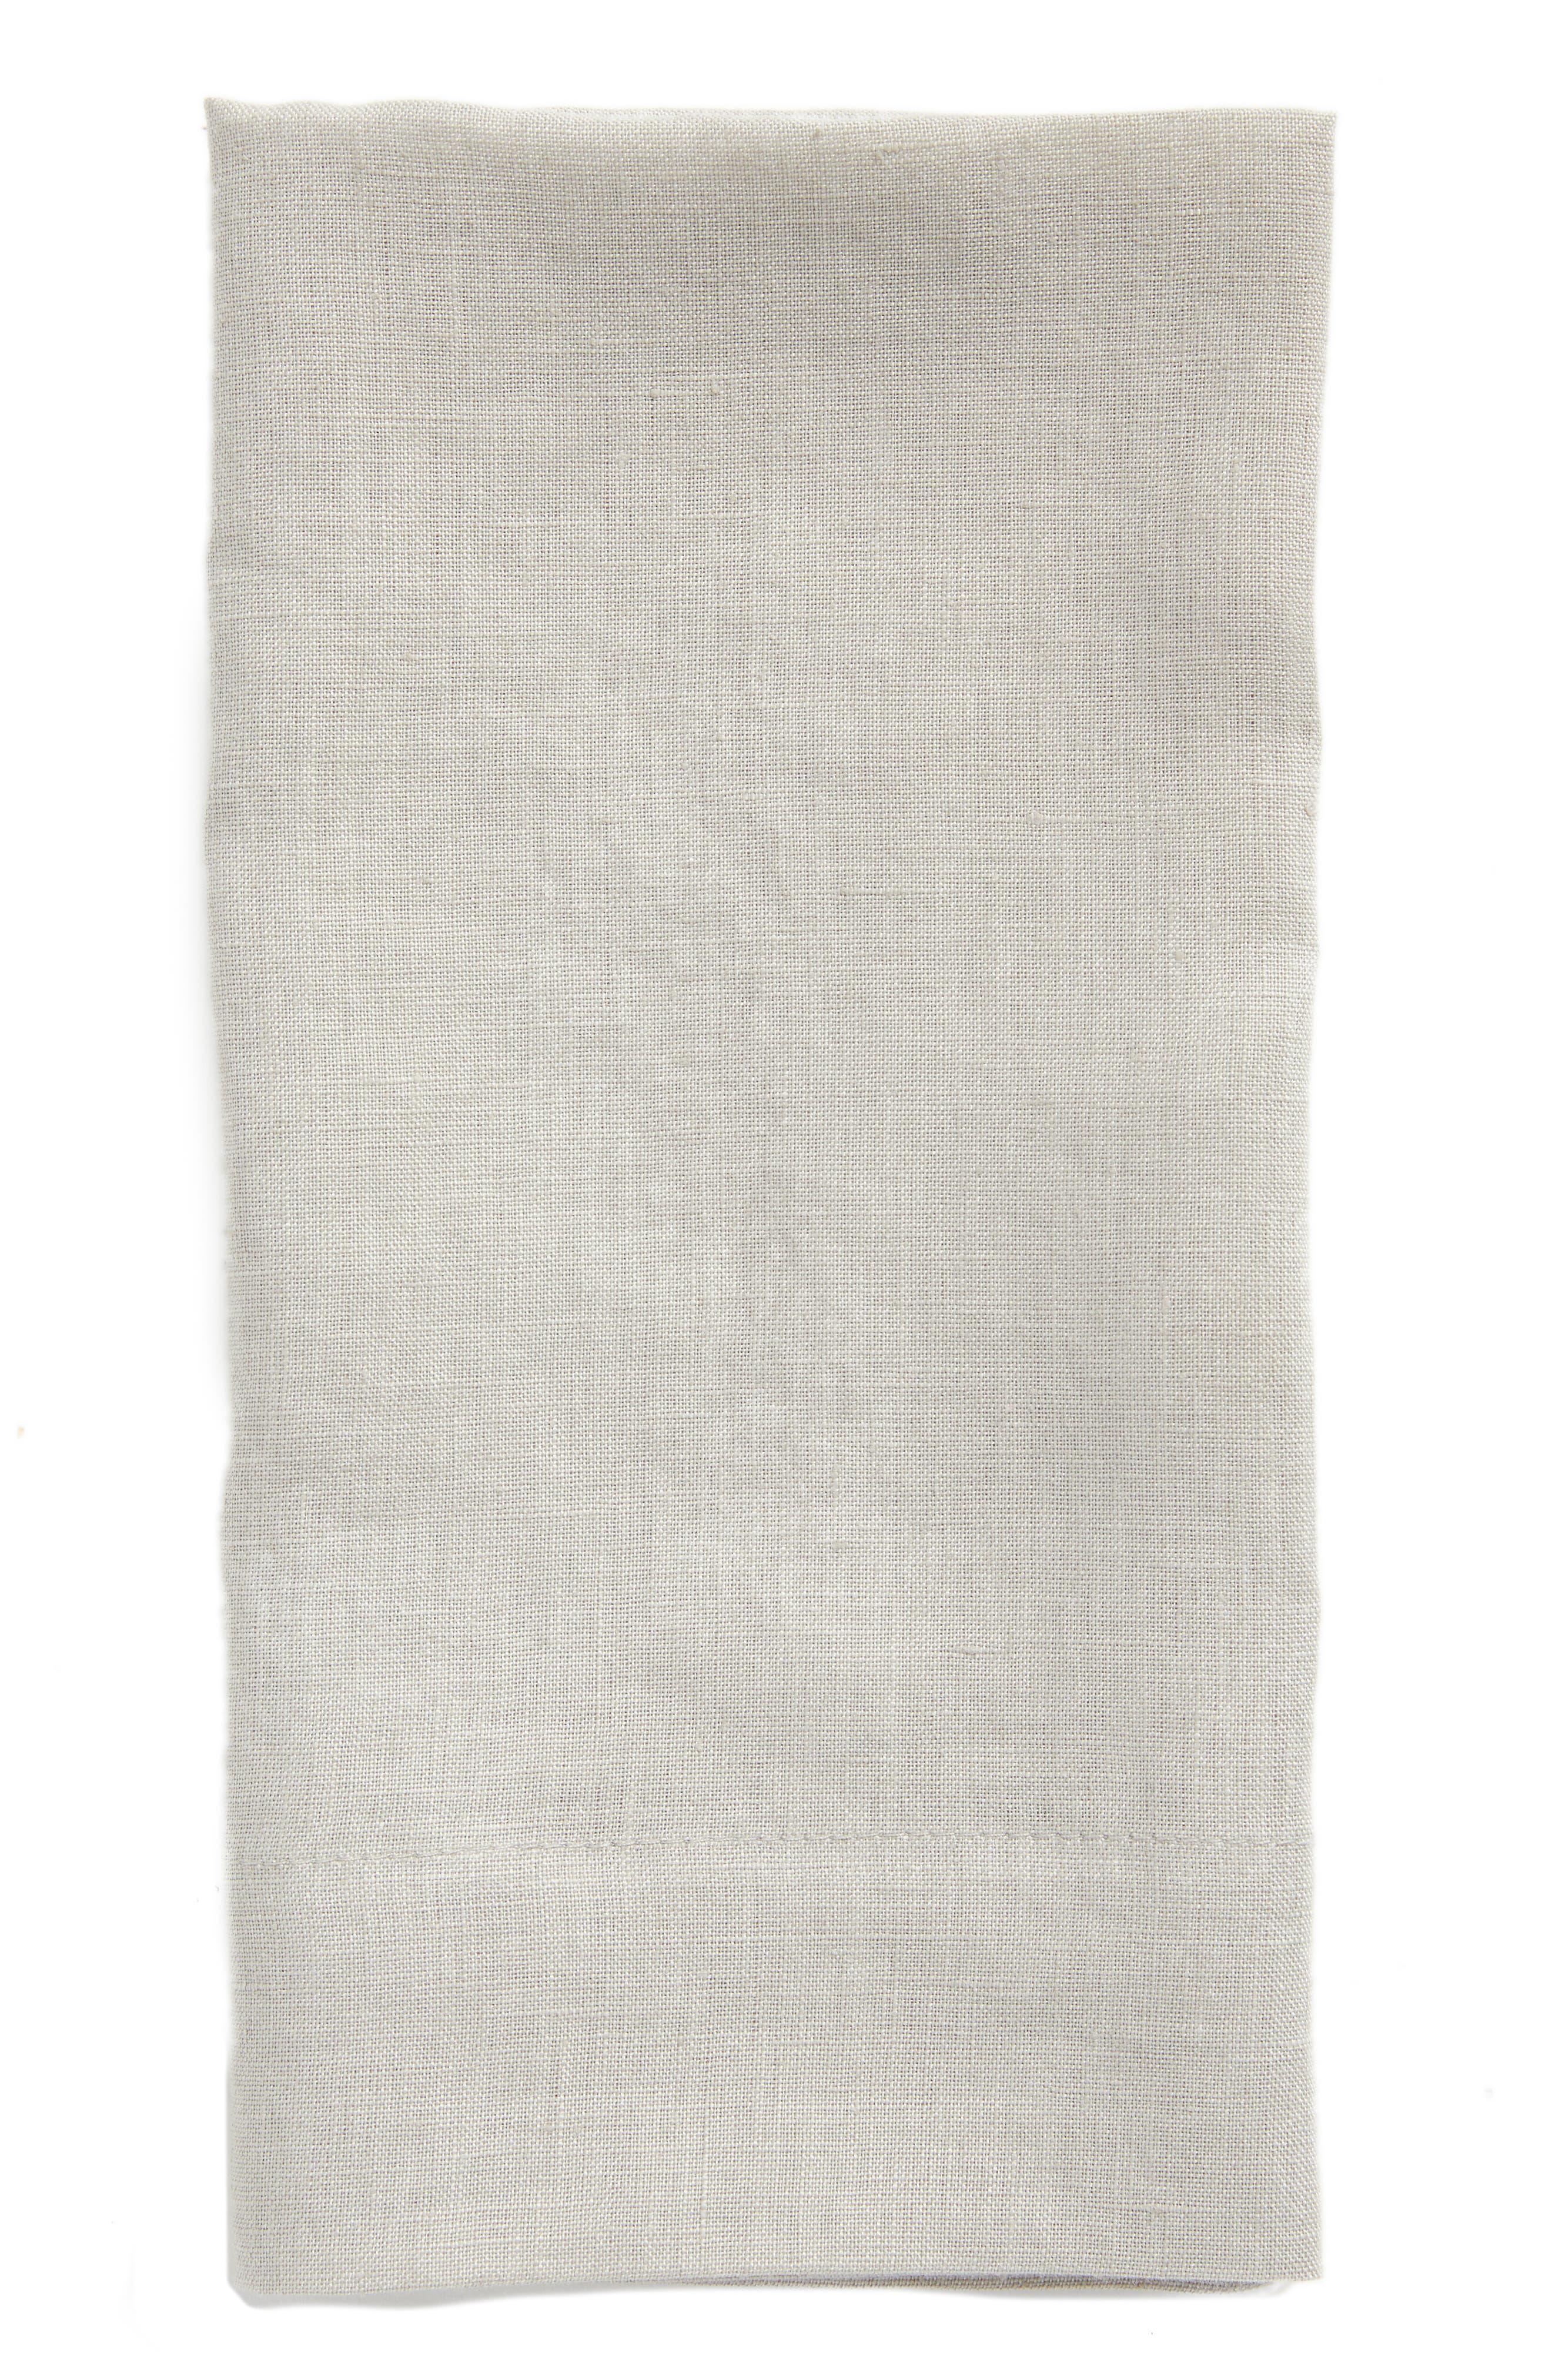 Washed Linen Napkin,                             Main thumbnail 1, color,                             020